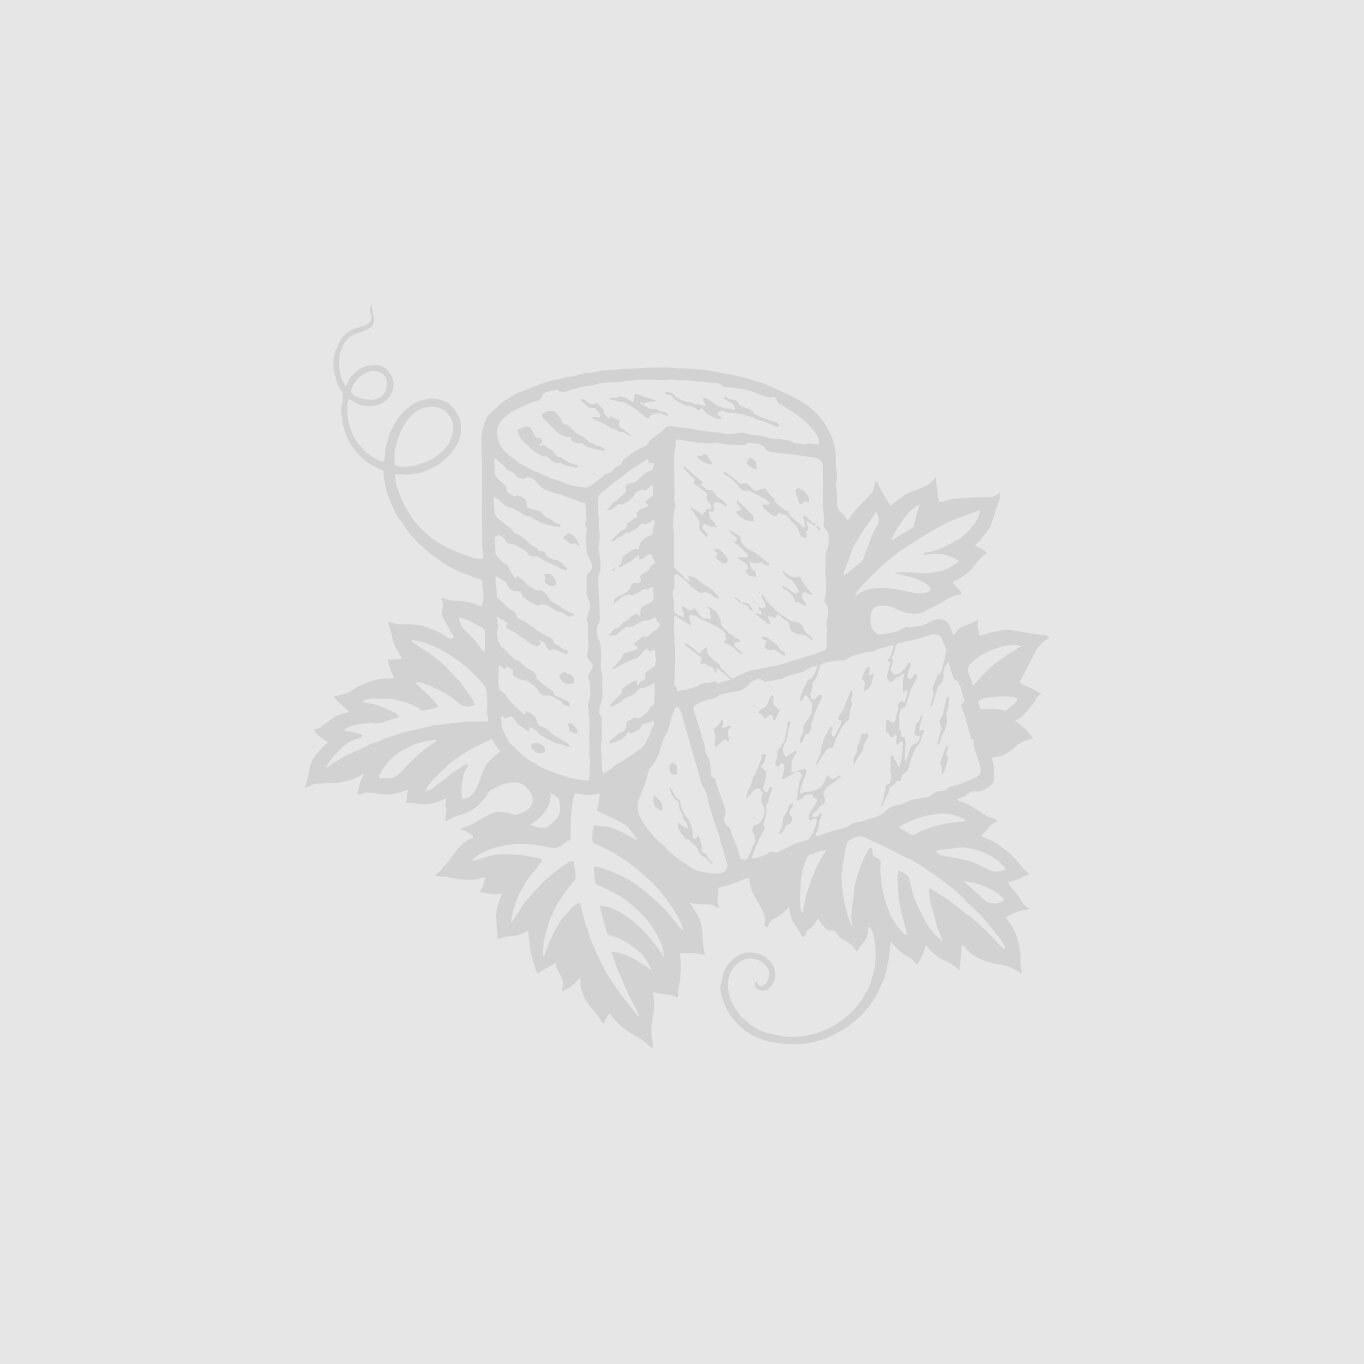 Ditcheat Hill Cider 2019